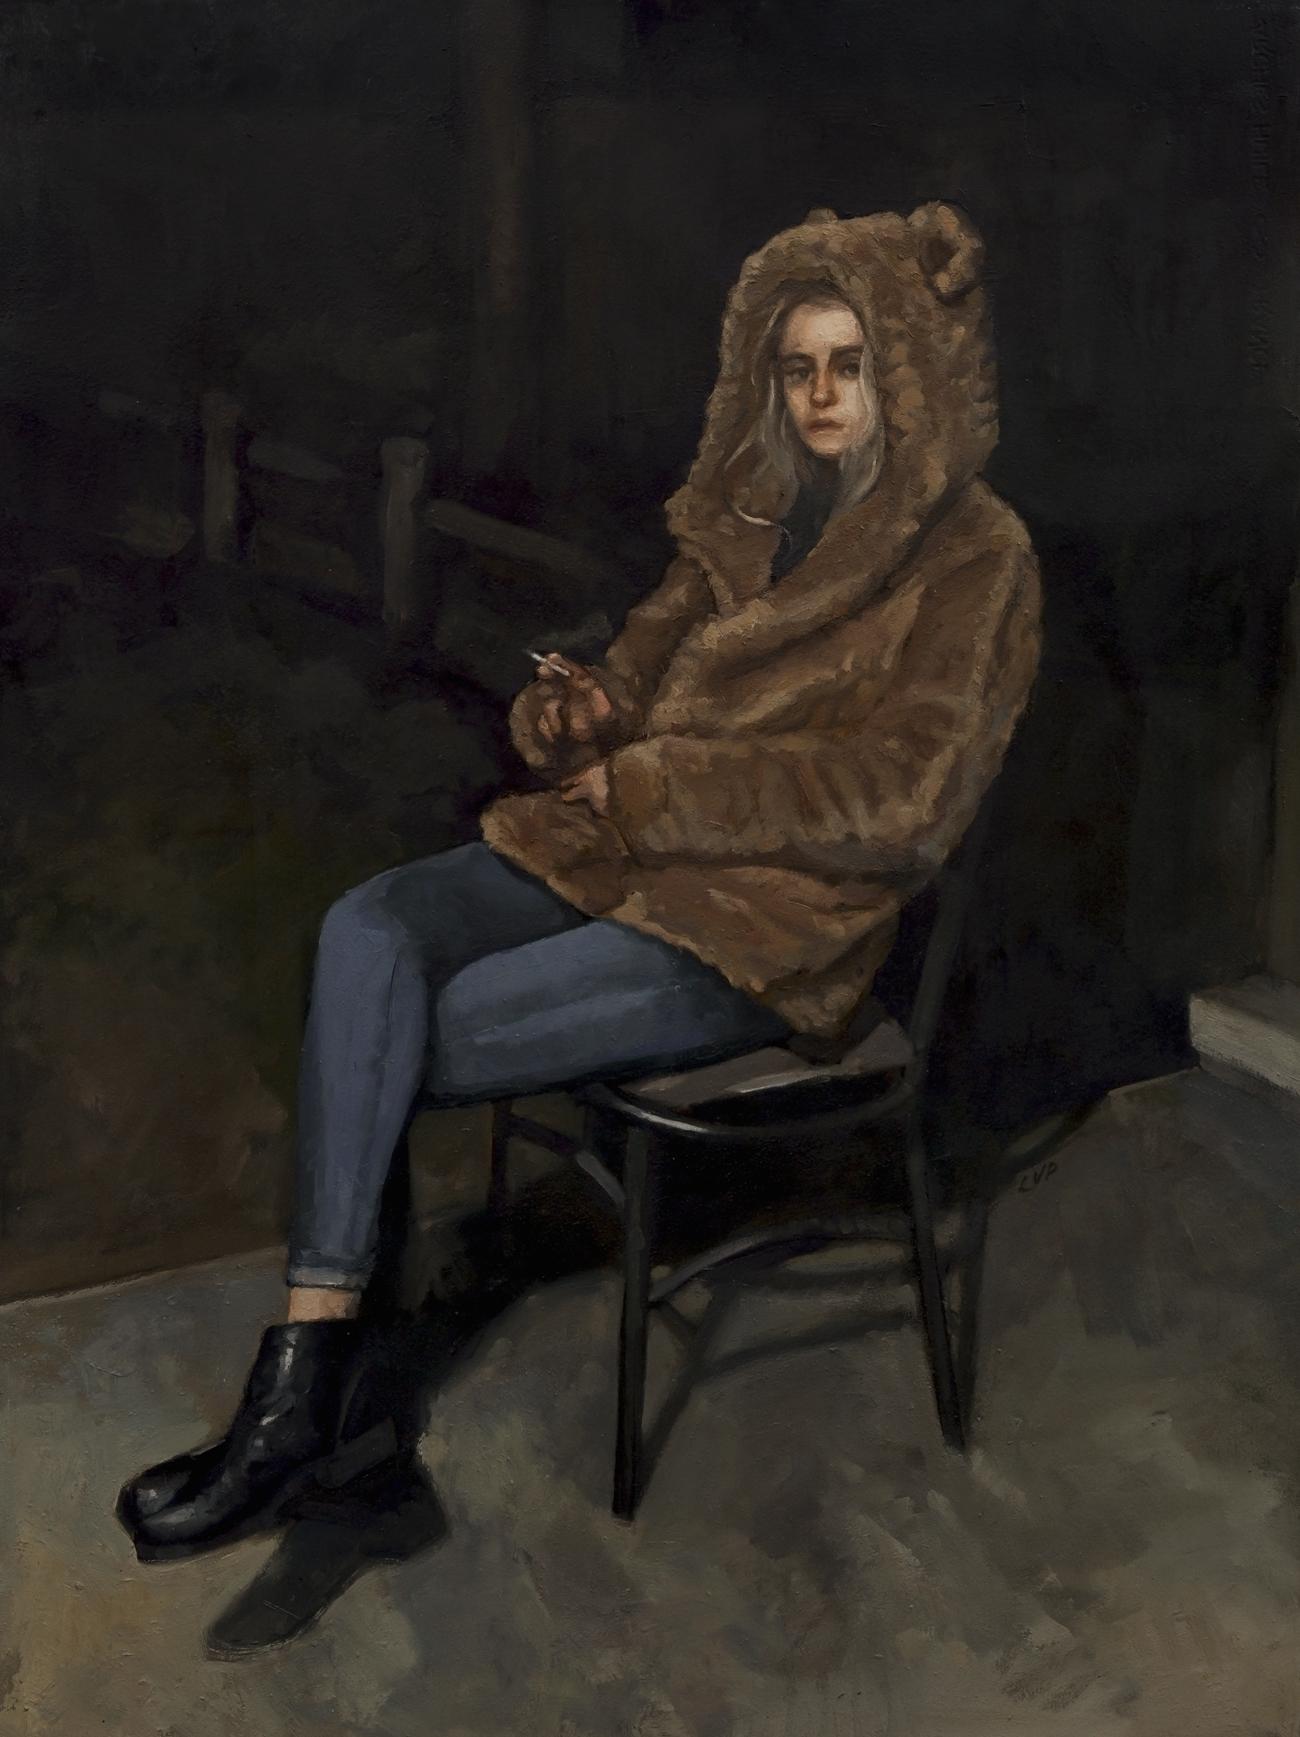 Ash in her bear coat